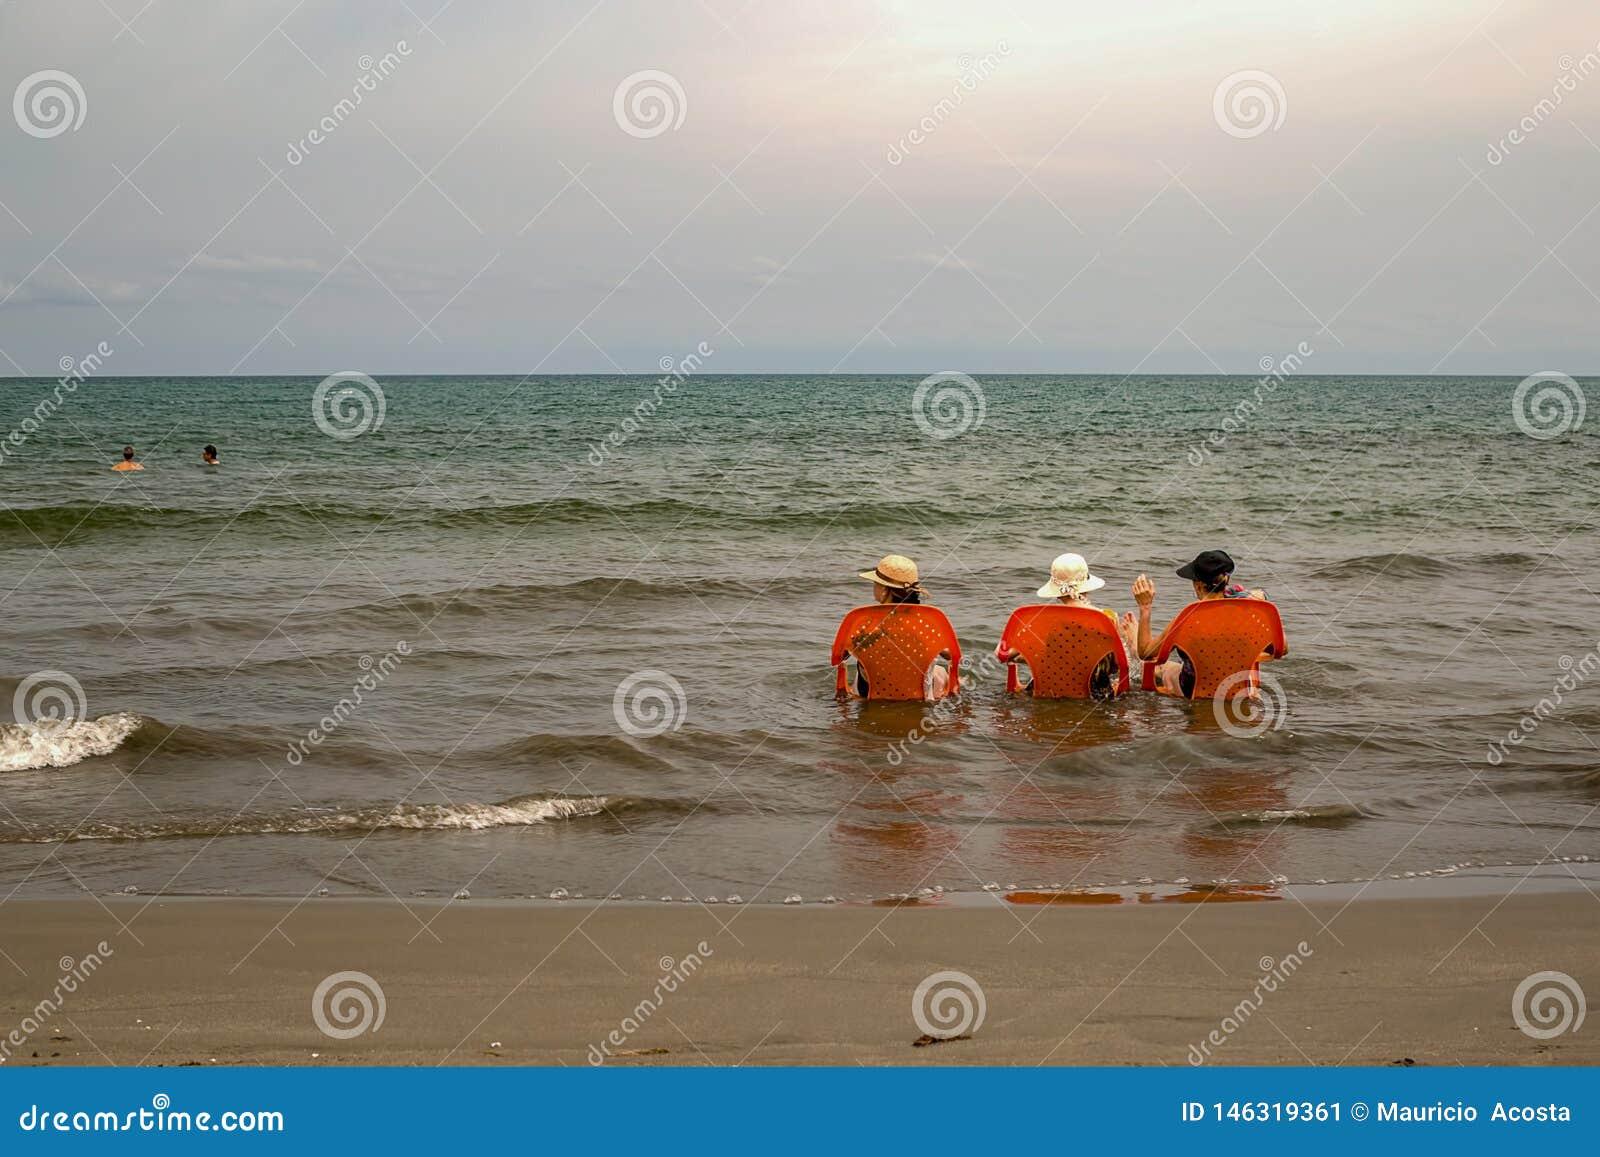 Three old ladies sea bathing in the Caribbean